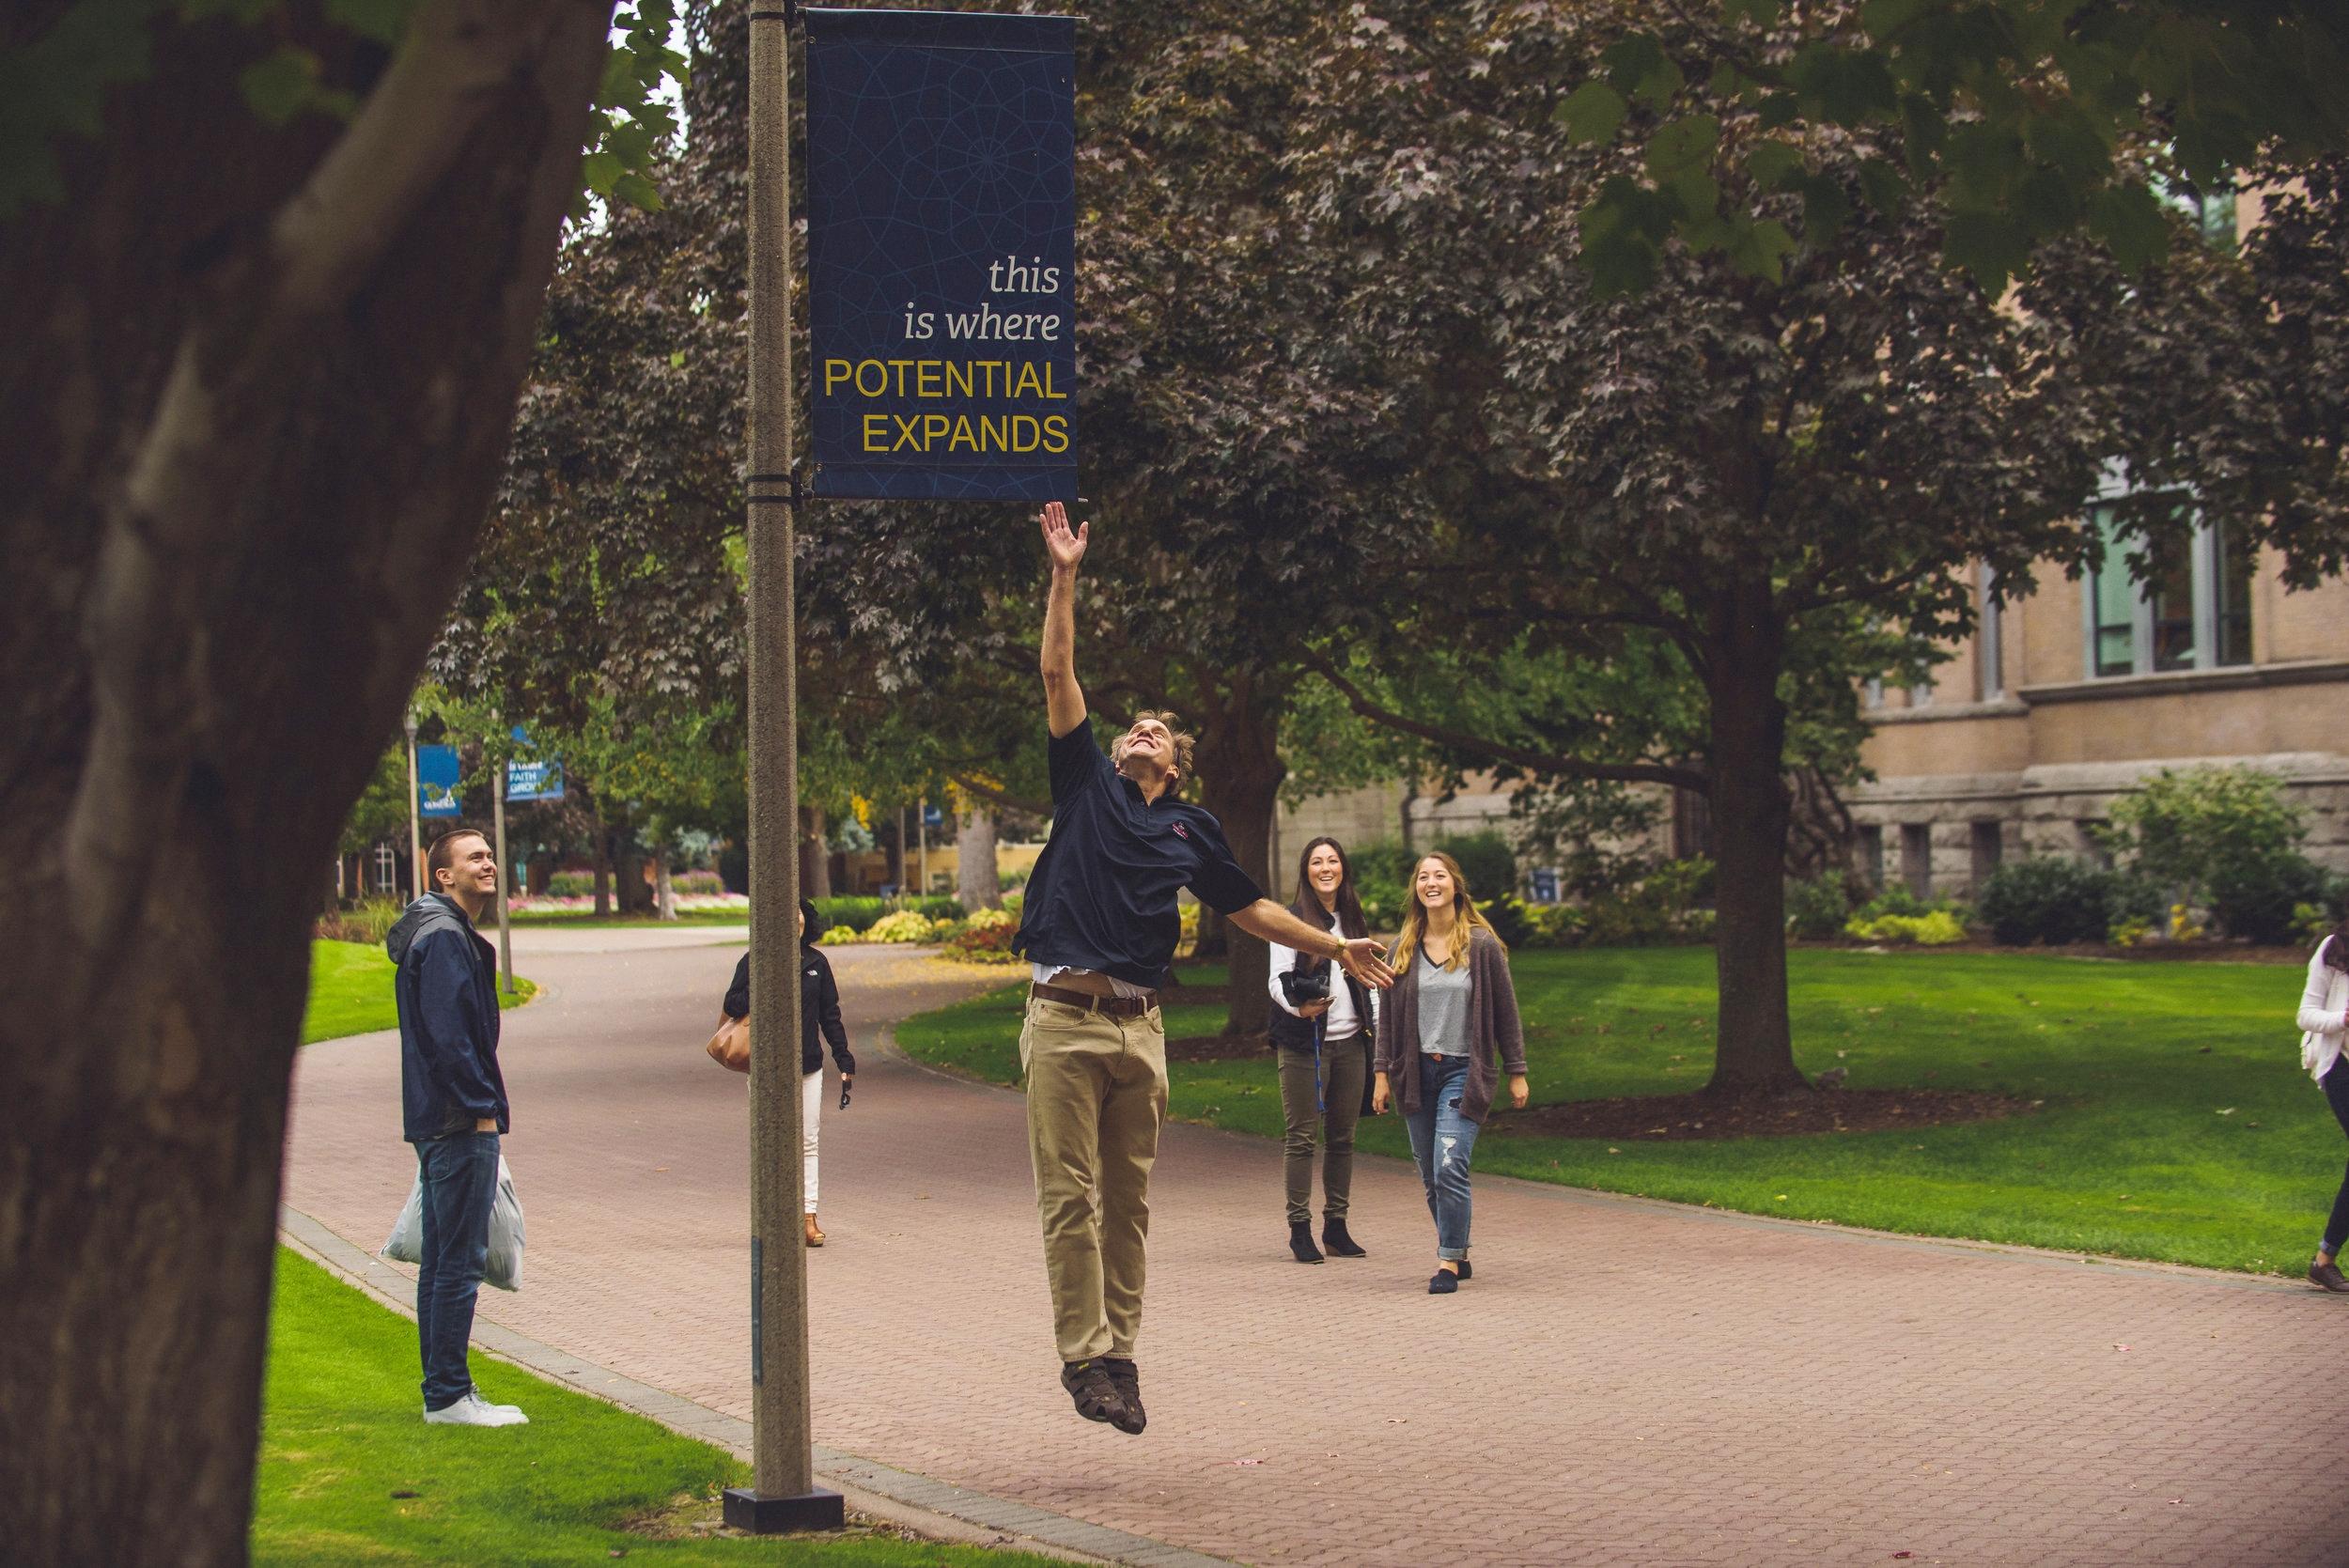 Students at Gonzaga University (photo by Gonzaga University)